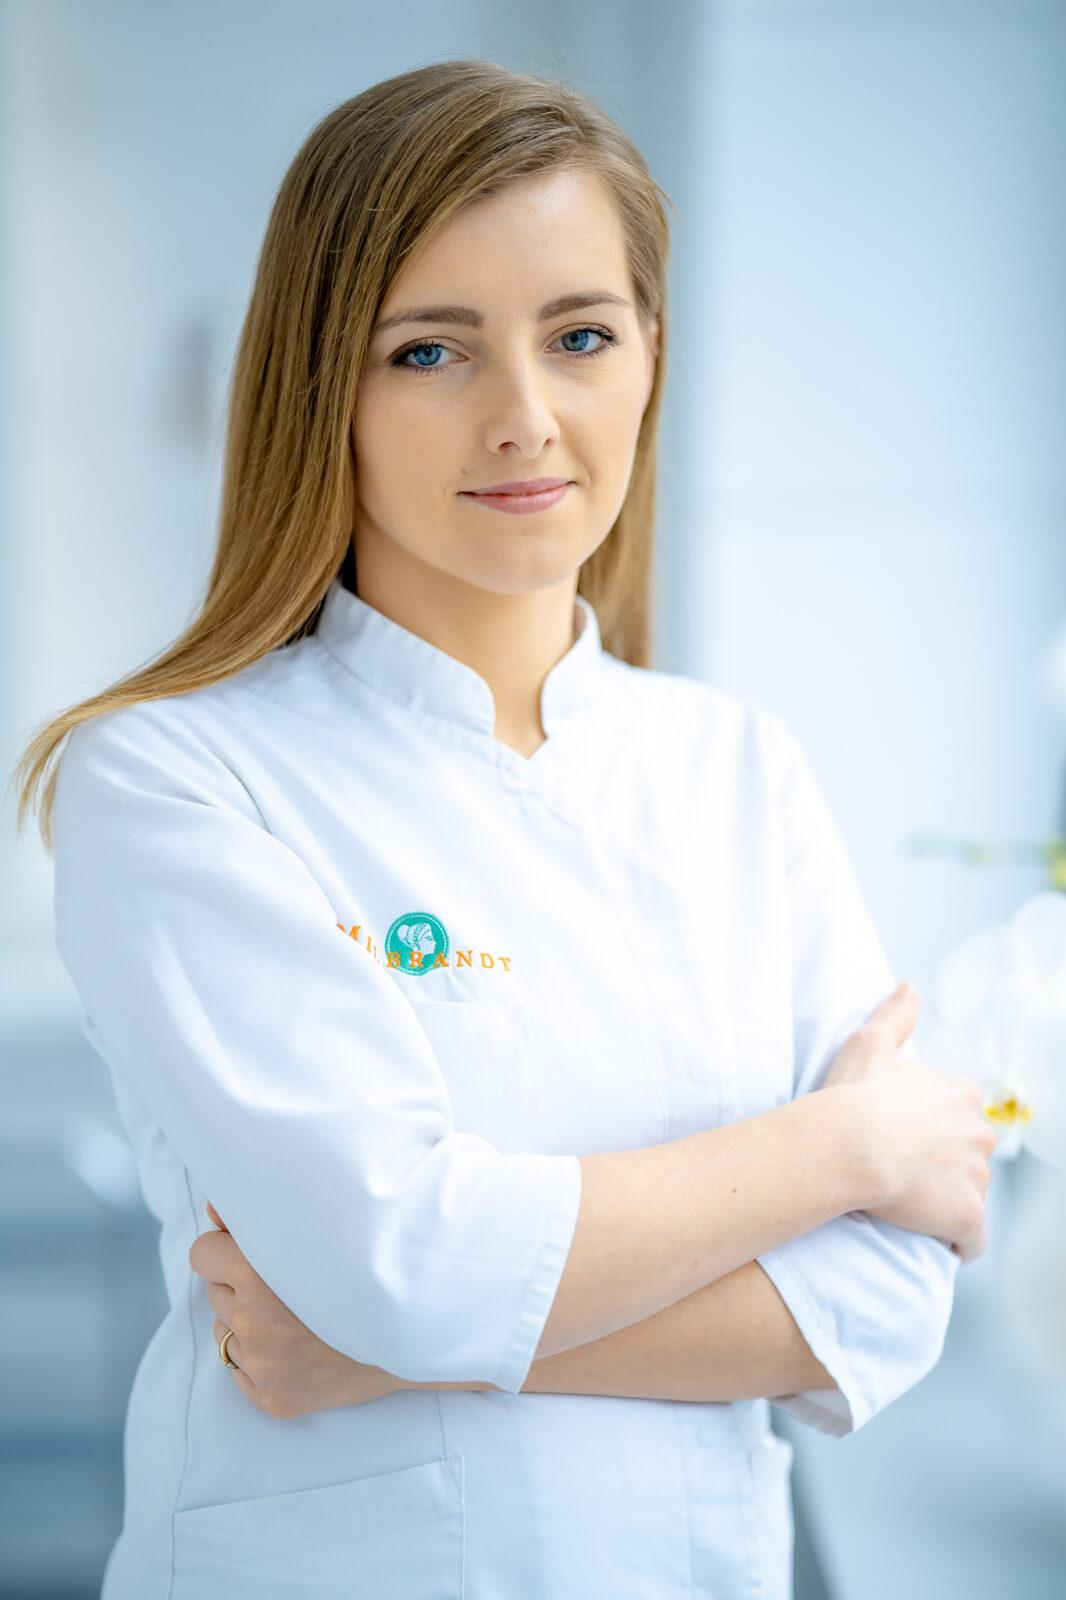 Izabela Tarasiuk gabinet medycyny estetycznej milbrandt